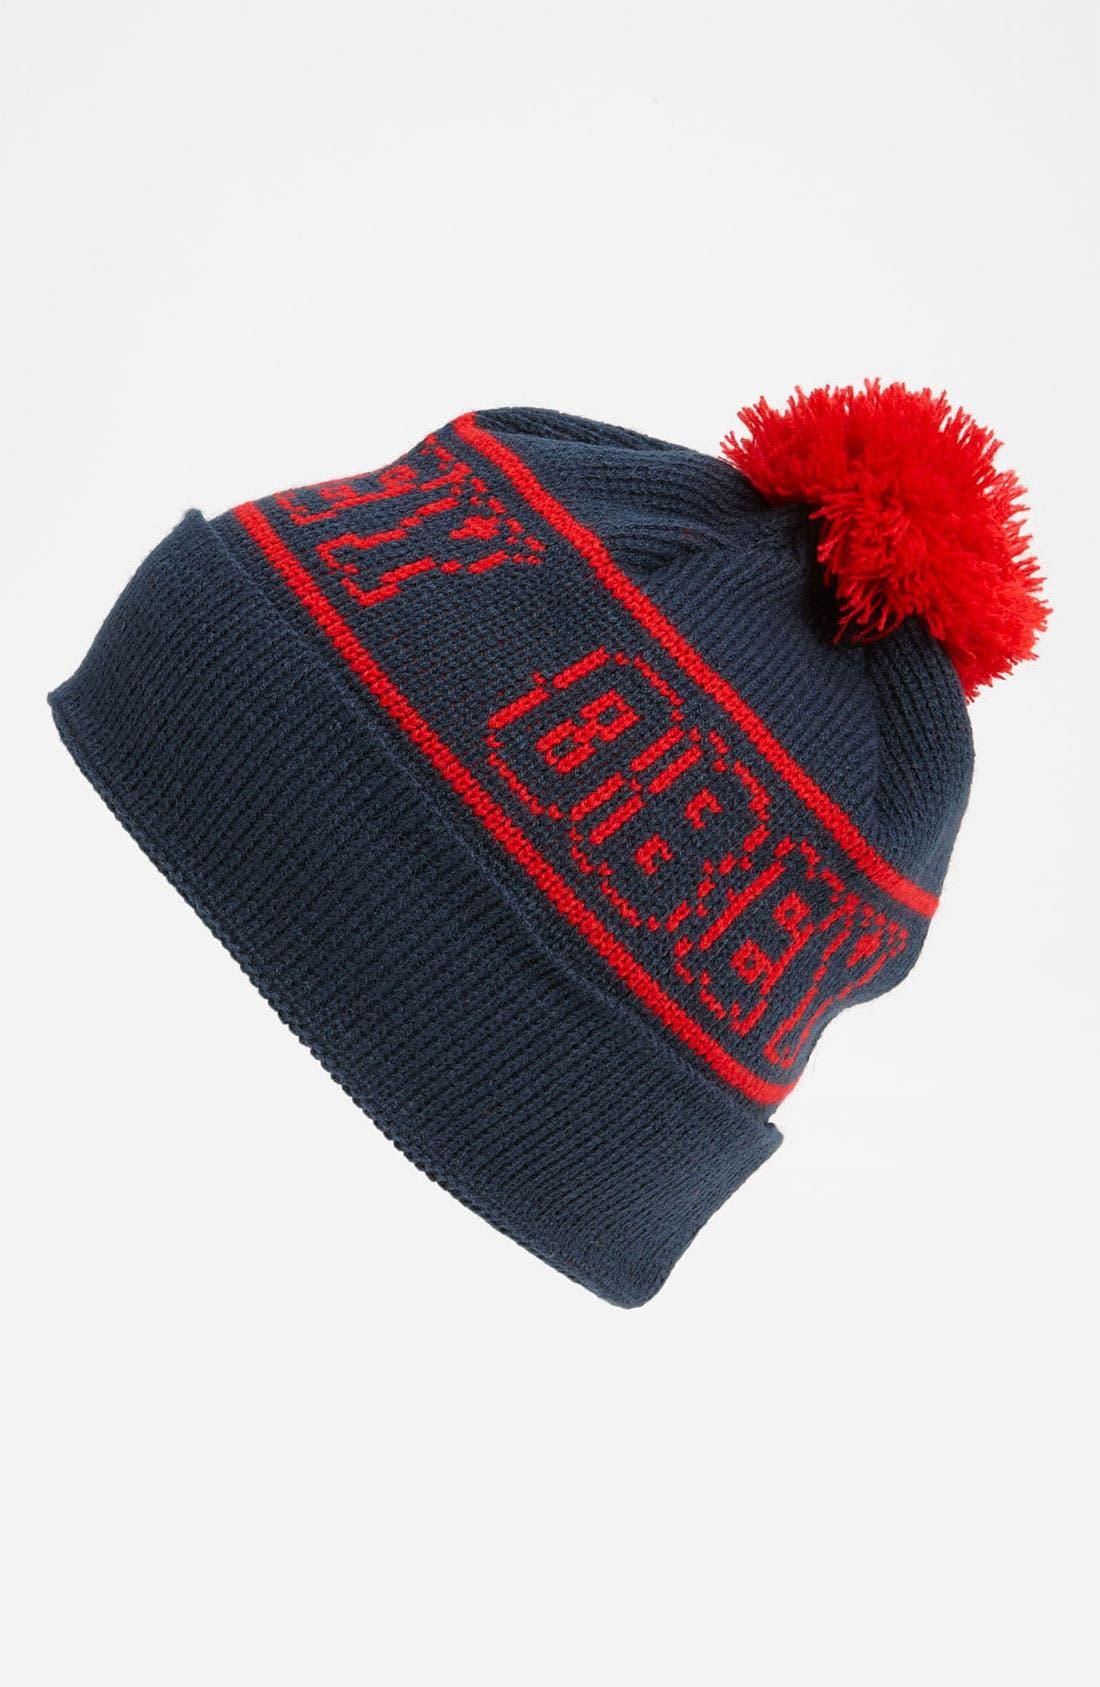 Alternate Image 1 Selected - Obey 'Gretsky' Knit Cap